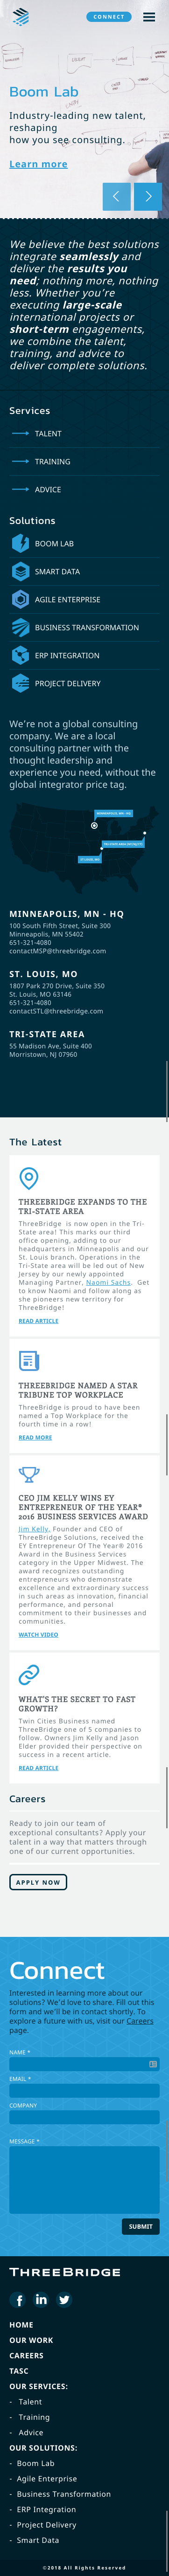 three bridge home page